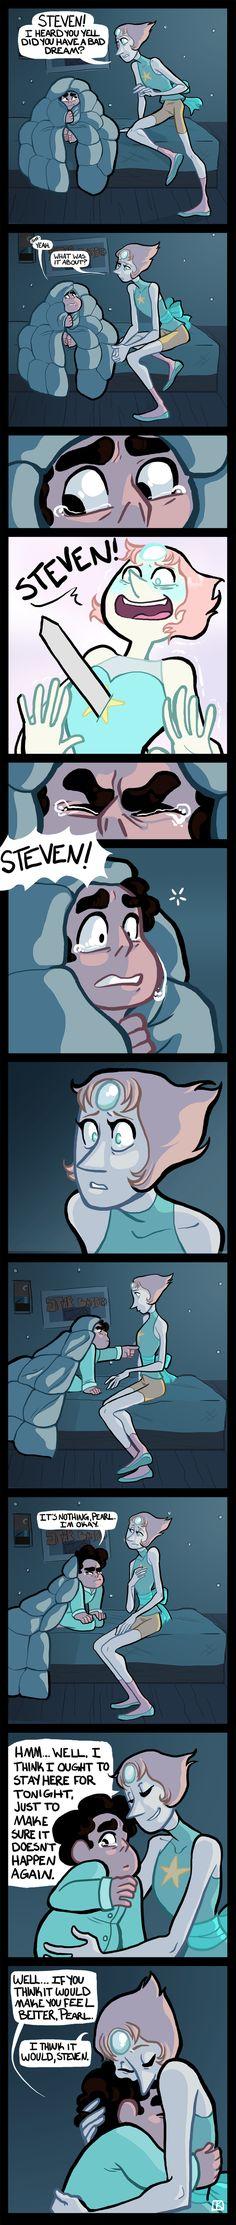 Steven and Pearl - comic